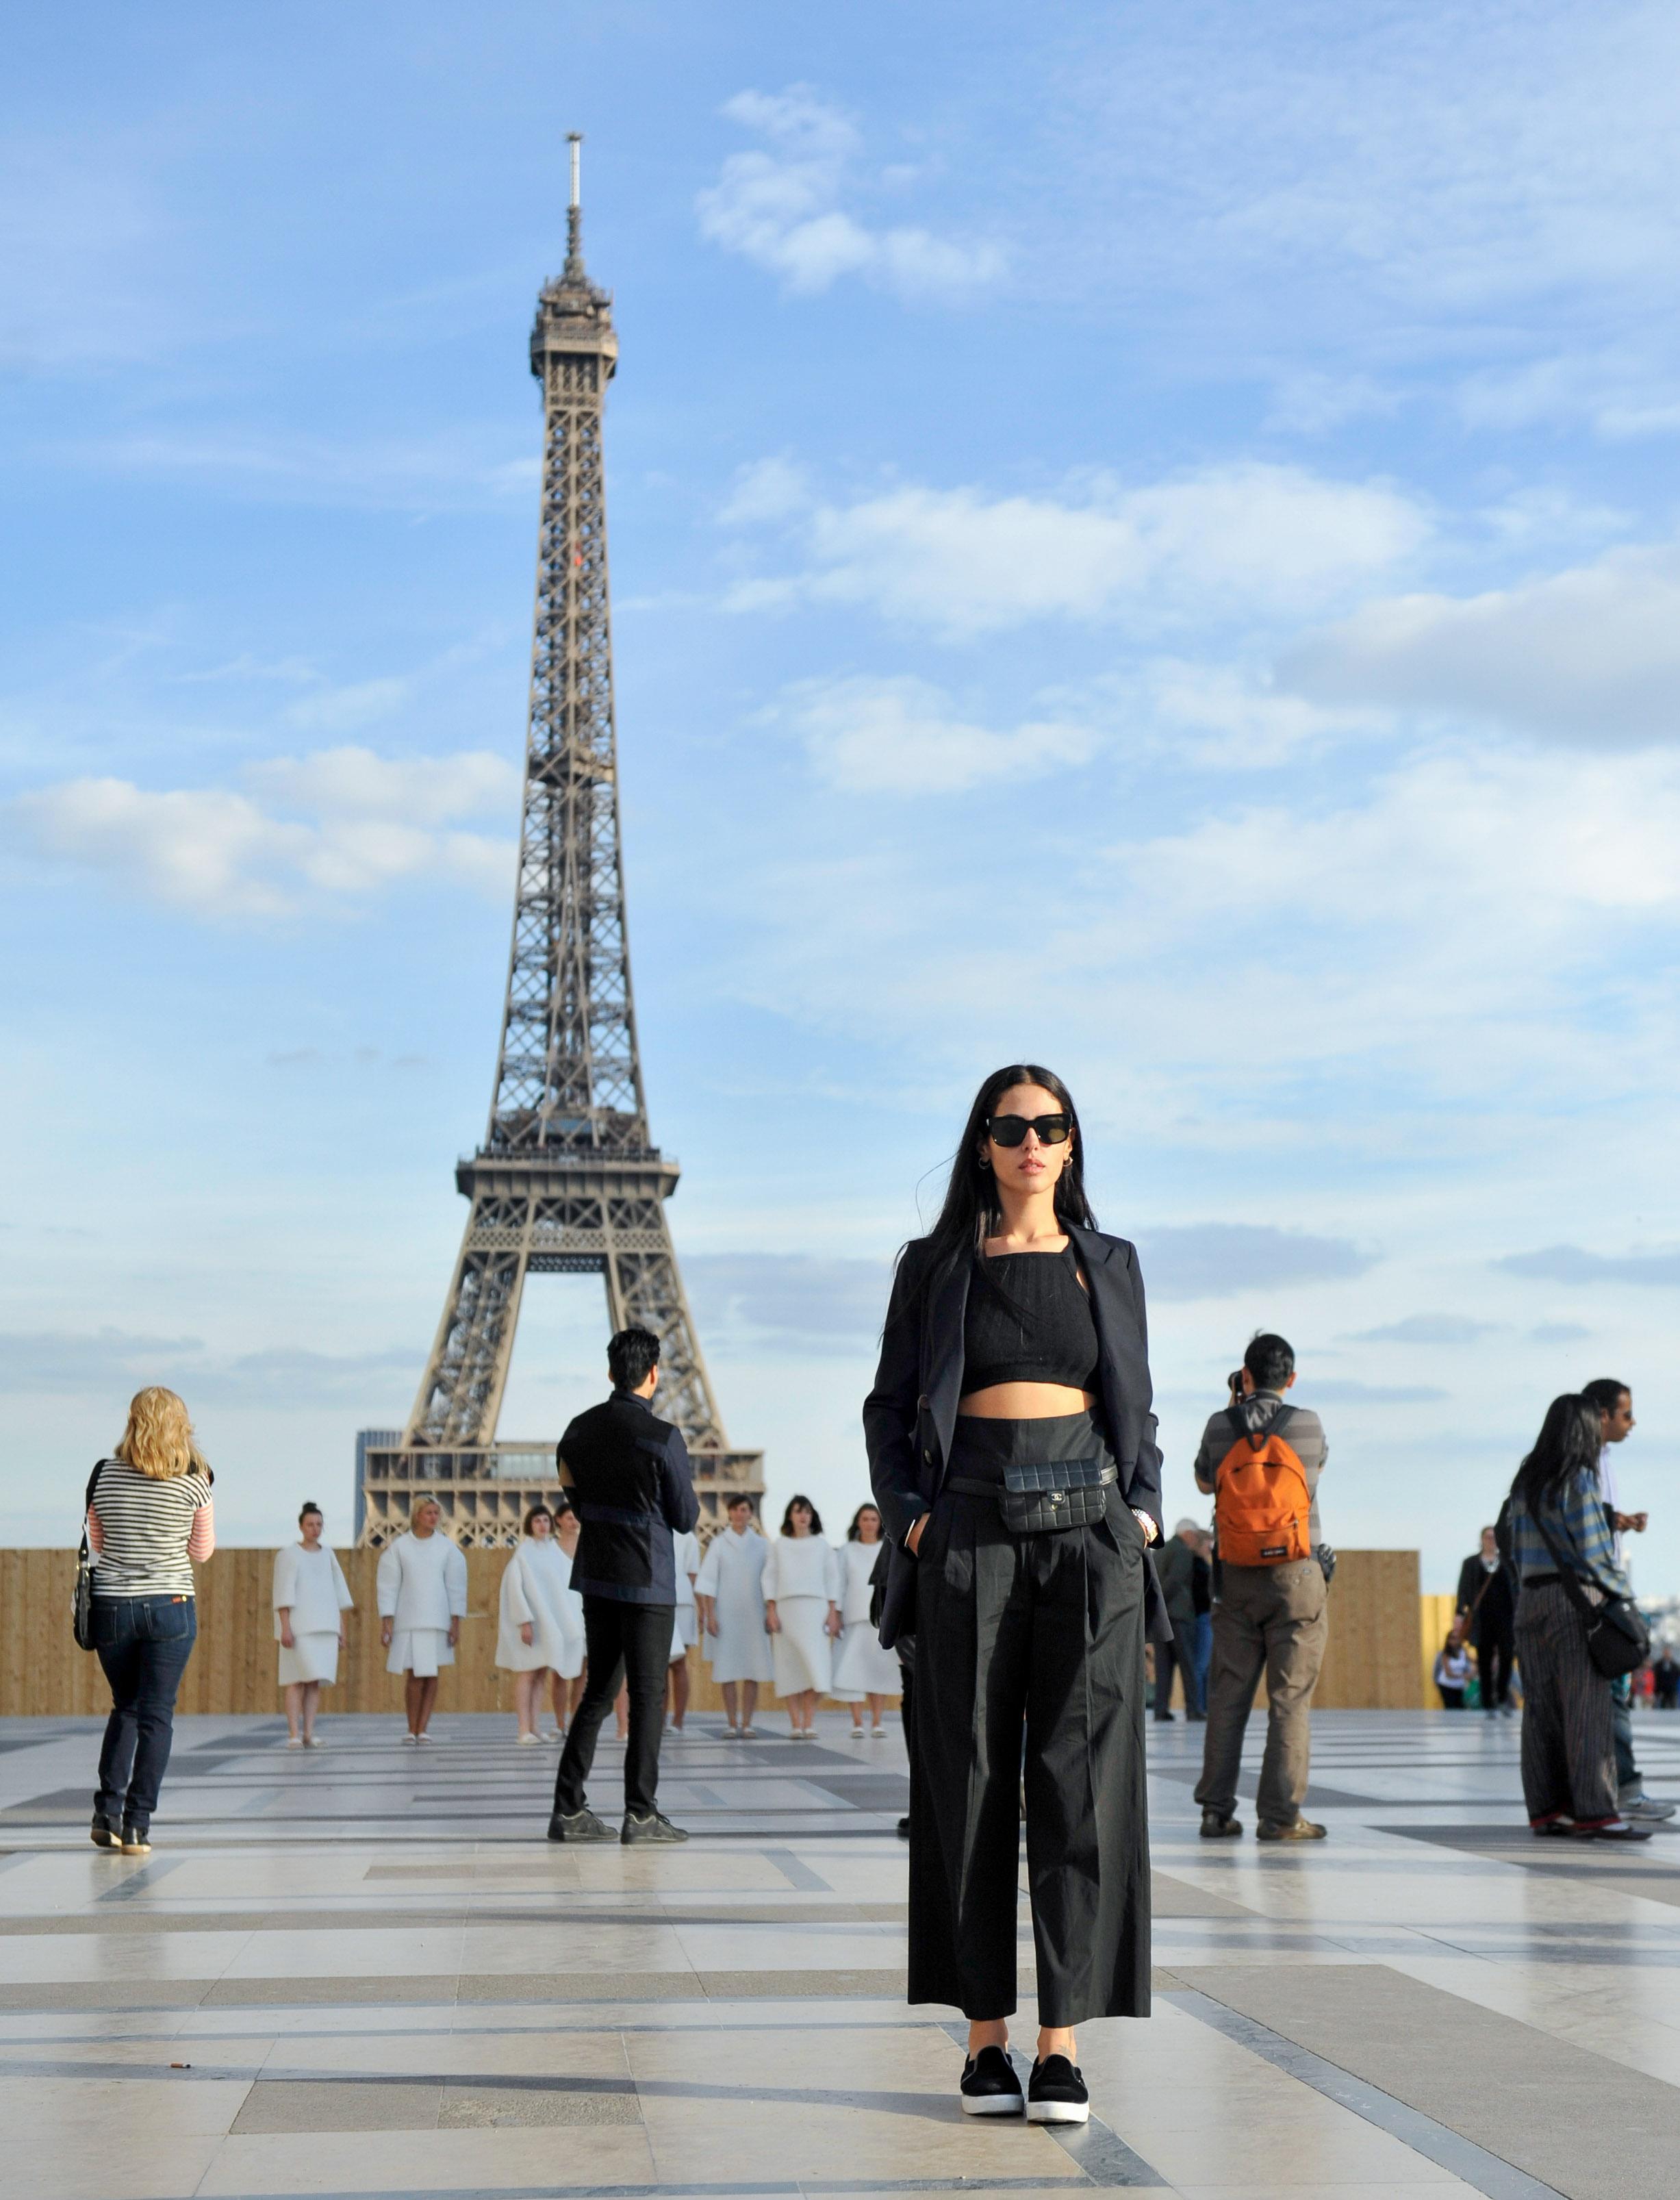 StreetStyle_ParisFashionWeek_LeandroJusten_078.jpg